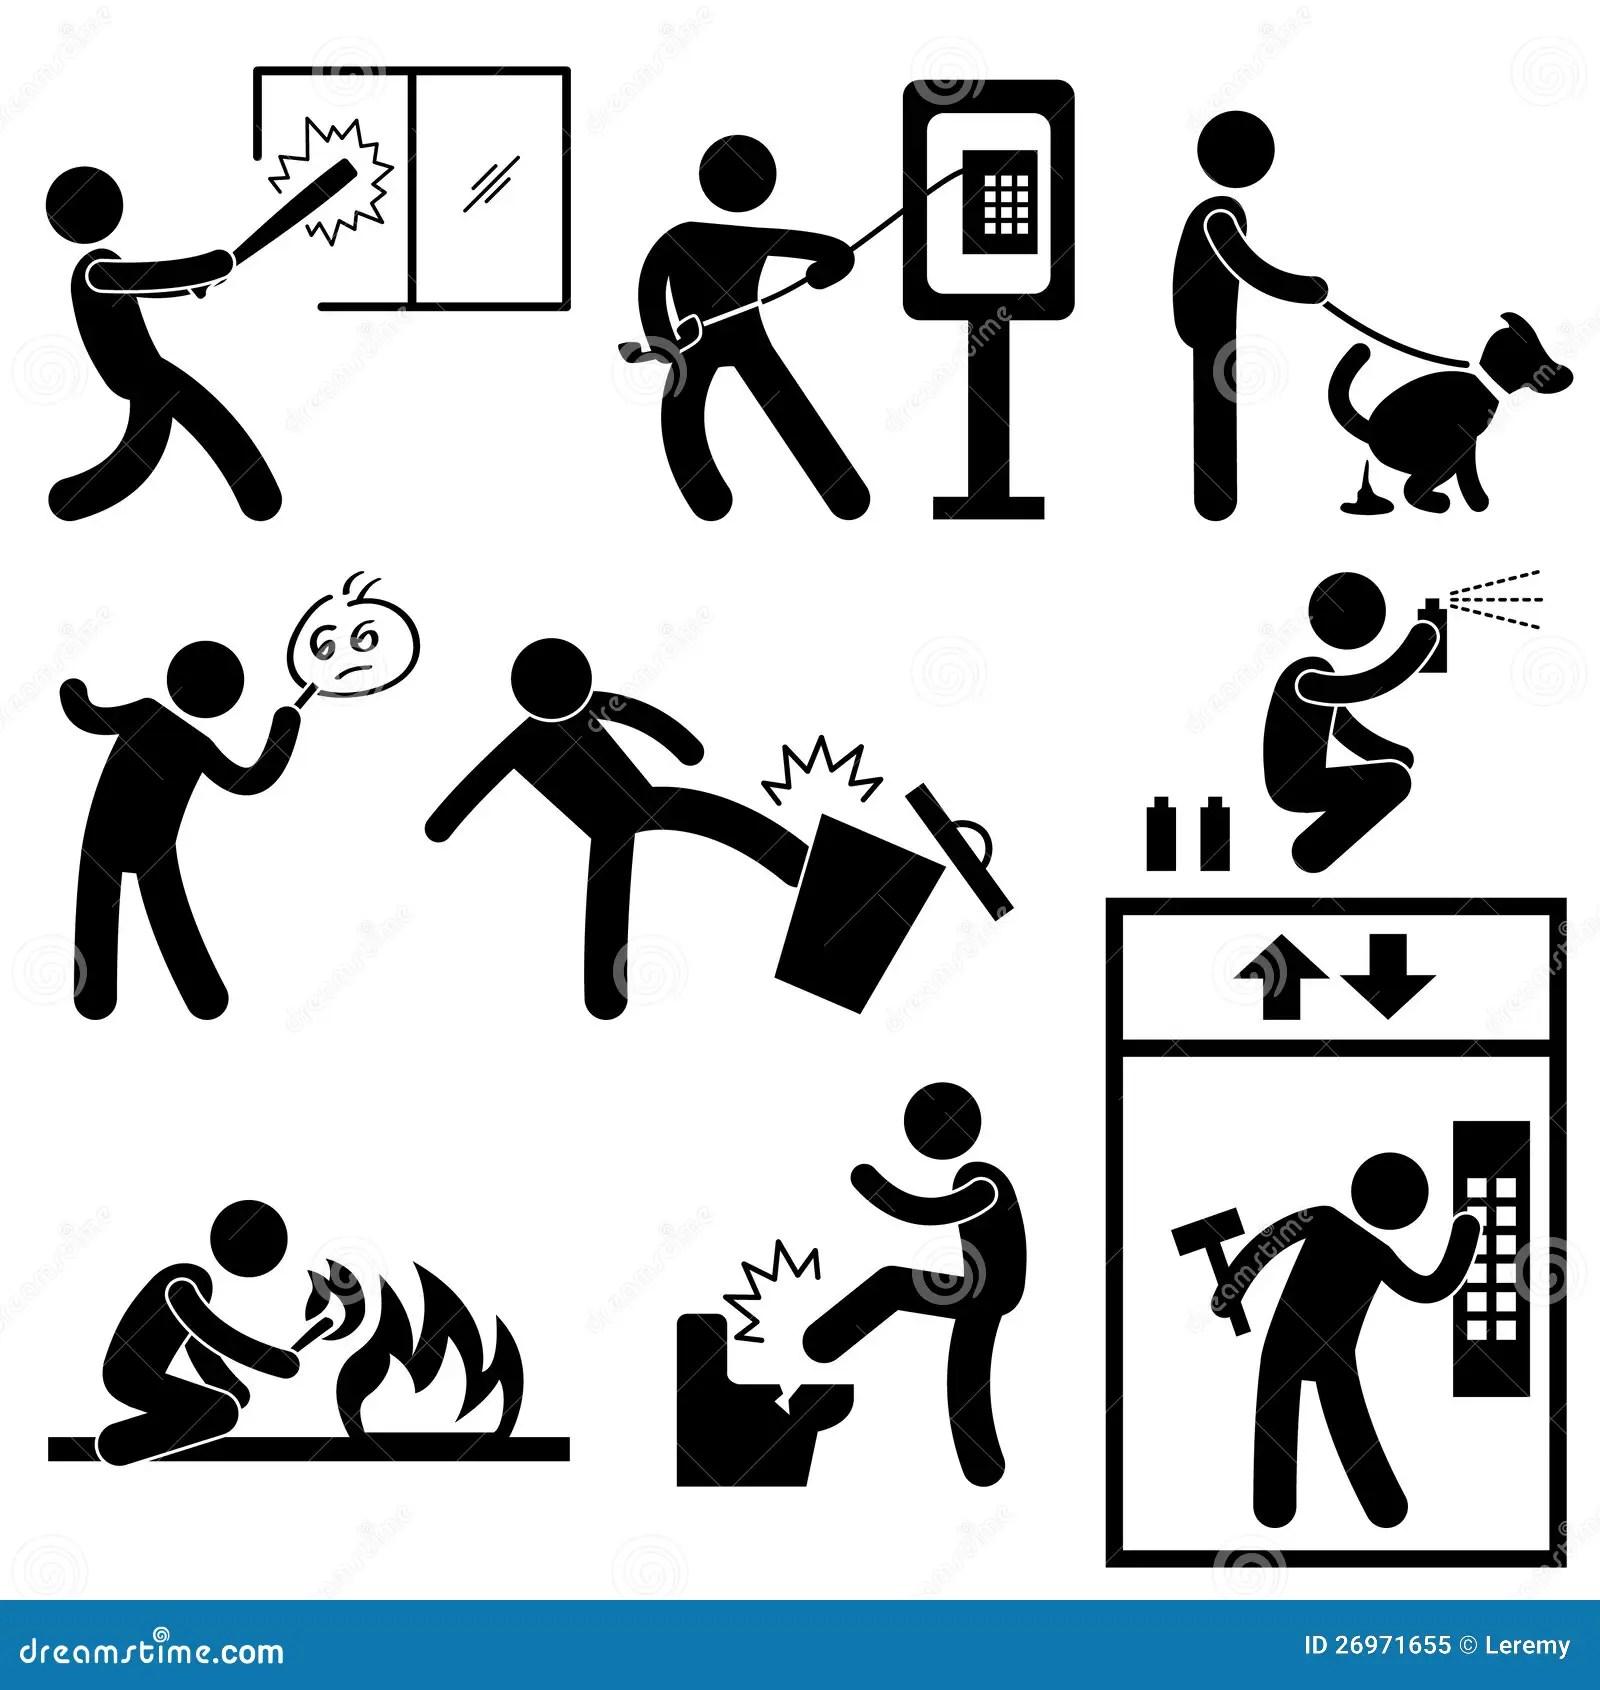 People Vandalism Violence Gangster Royalty Free Stock